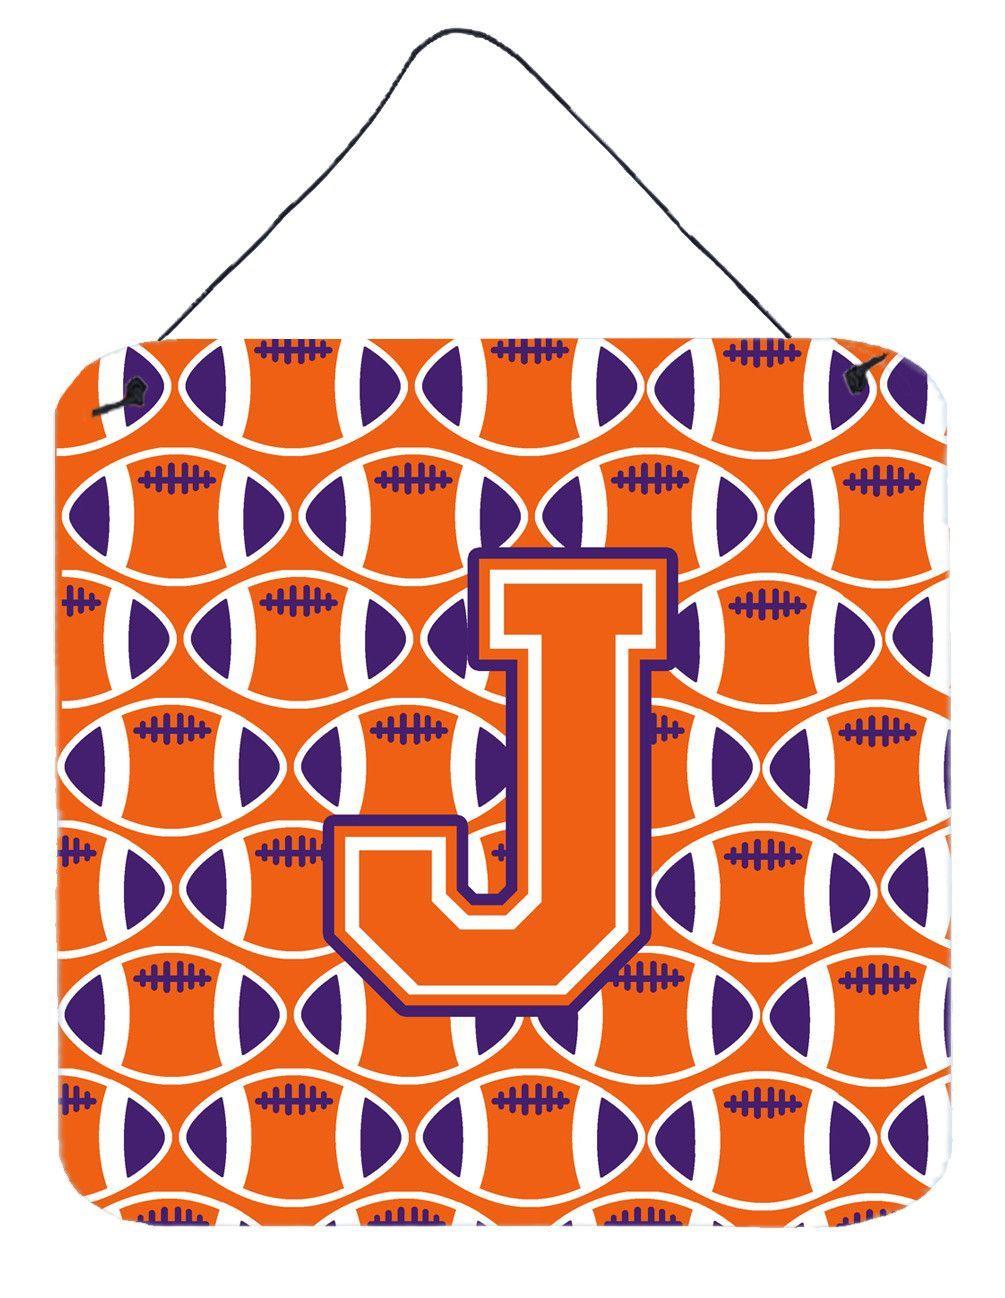 Letter J Football Orange, White and Regalia Wall or Door Hanging Prints CJ1072-JDS66